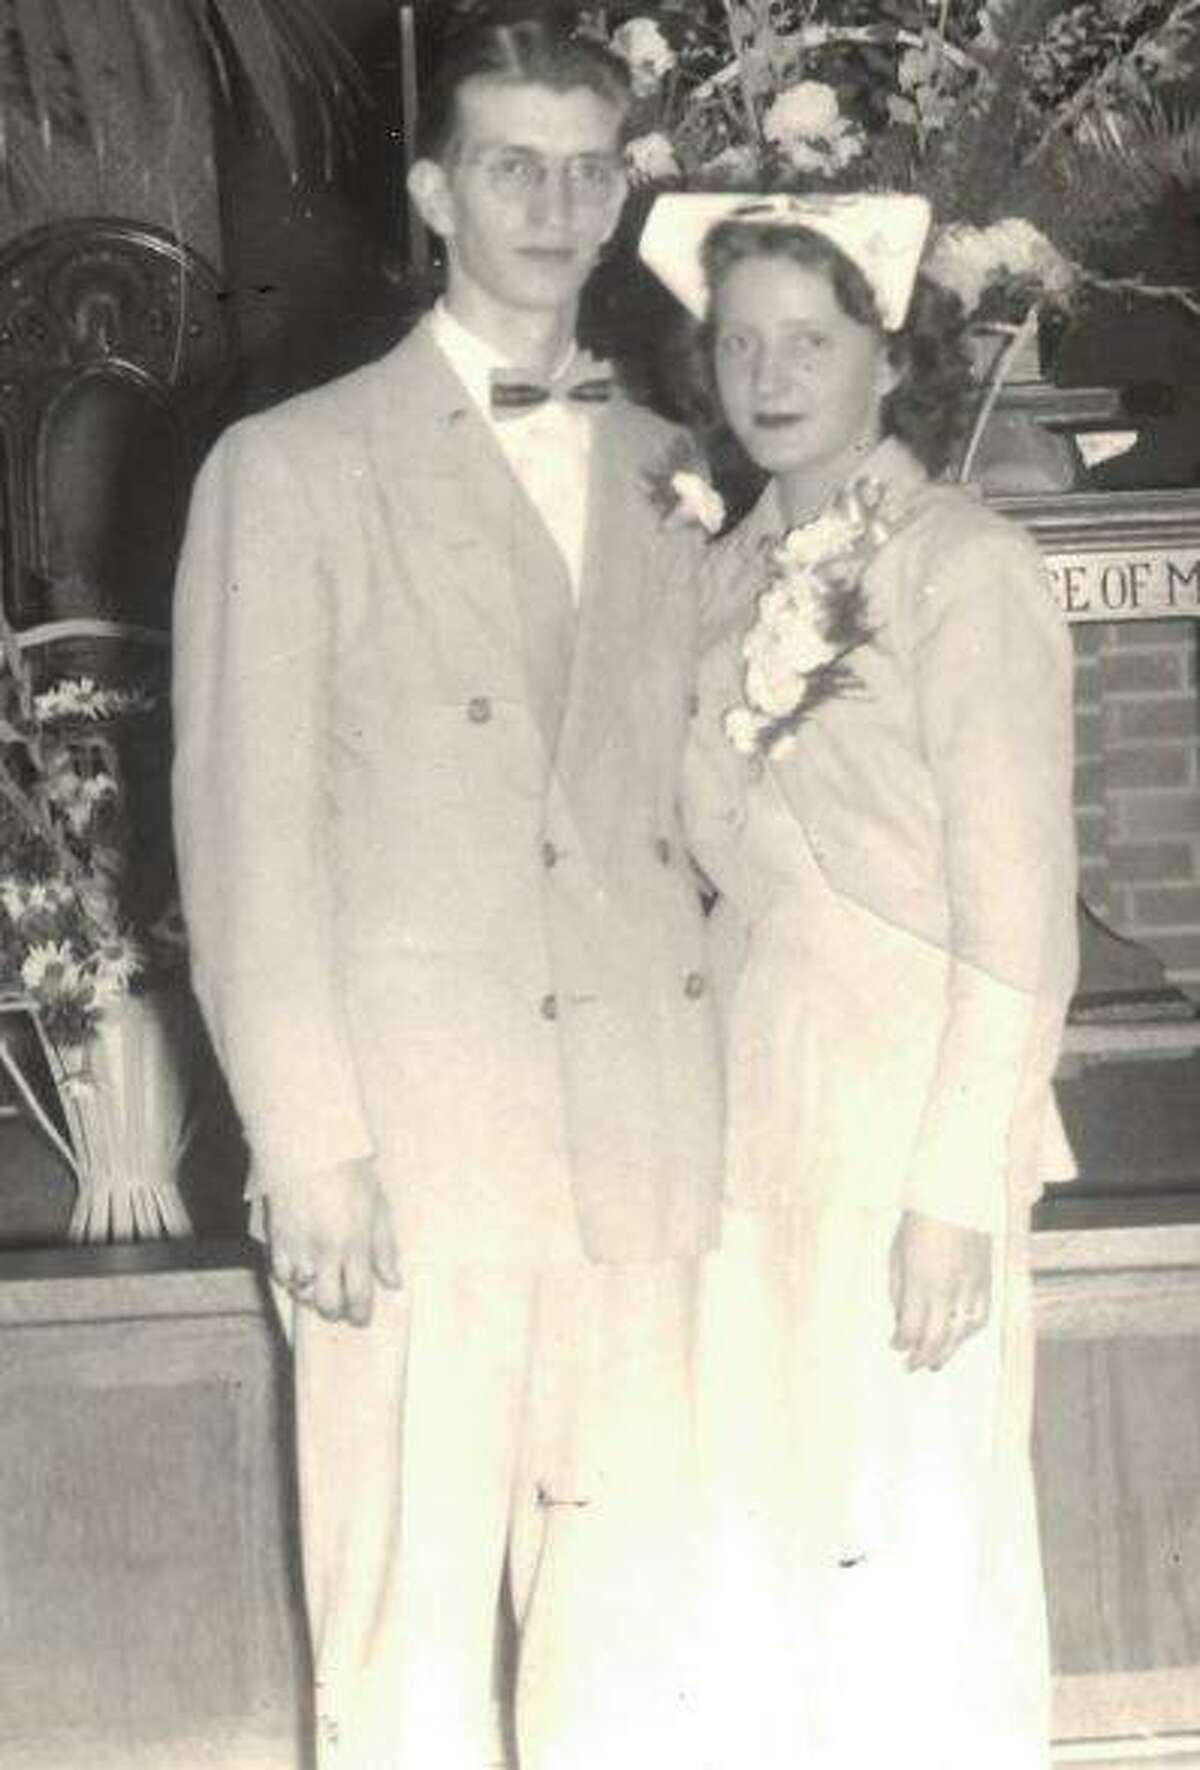 John and Mary Beard at their wedding